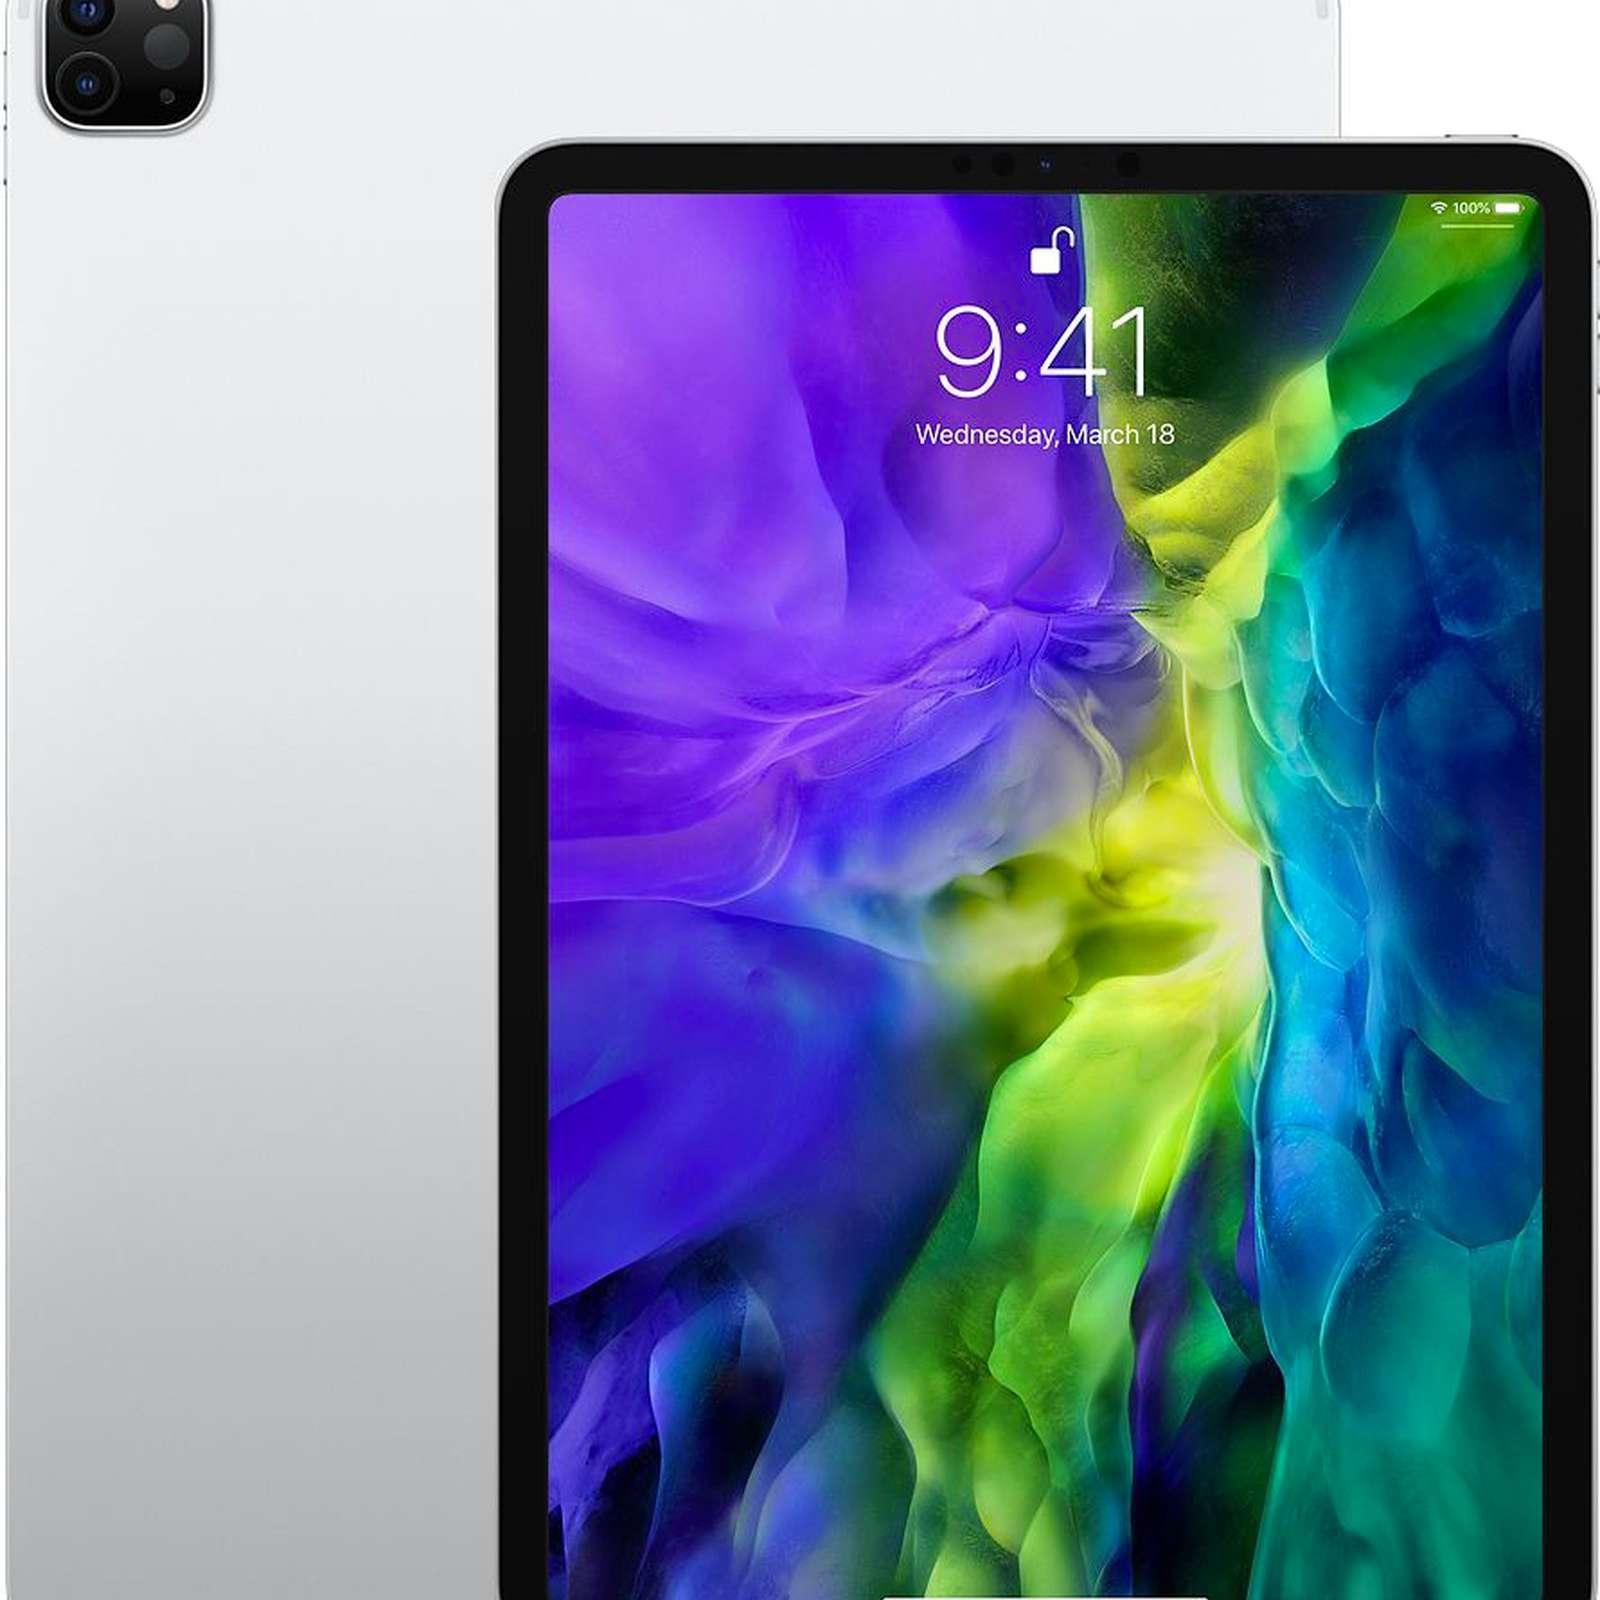 10.5-inch iPad Pro 2020